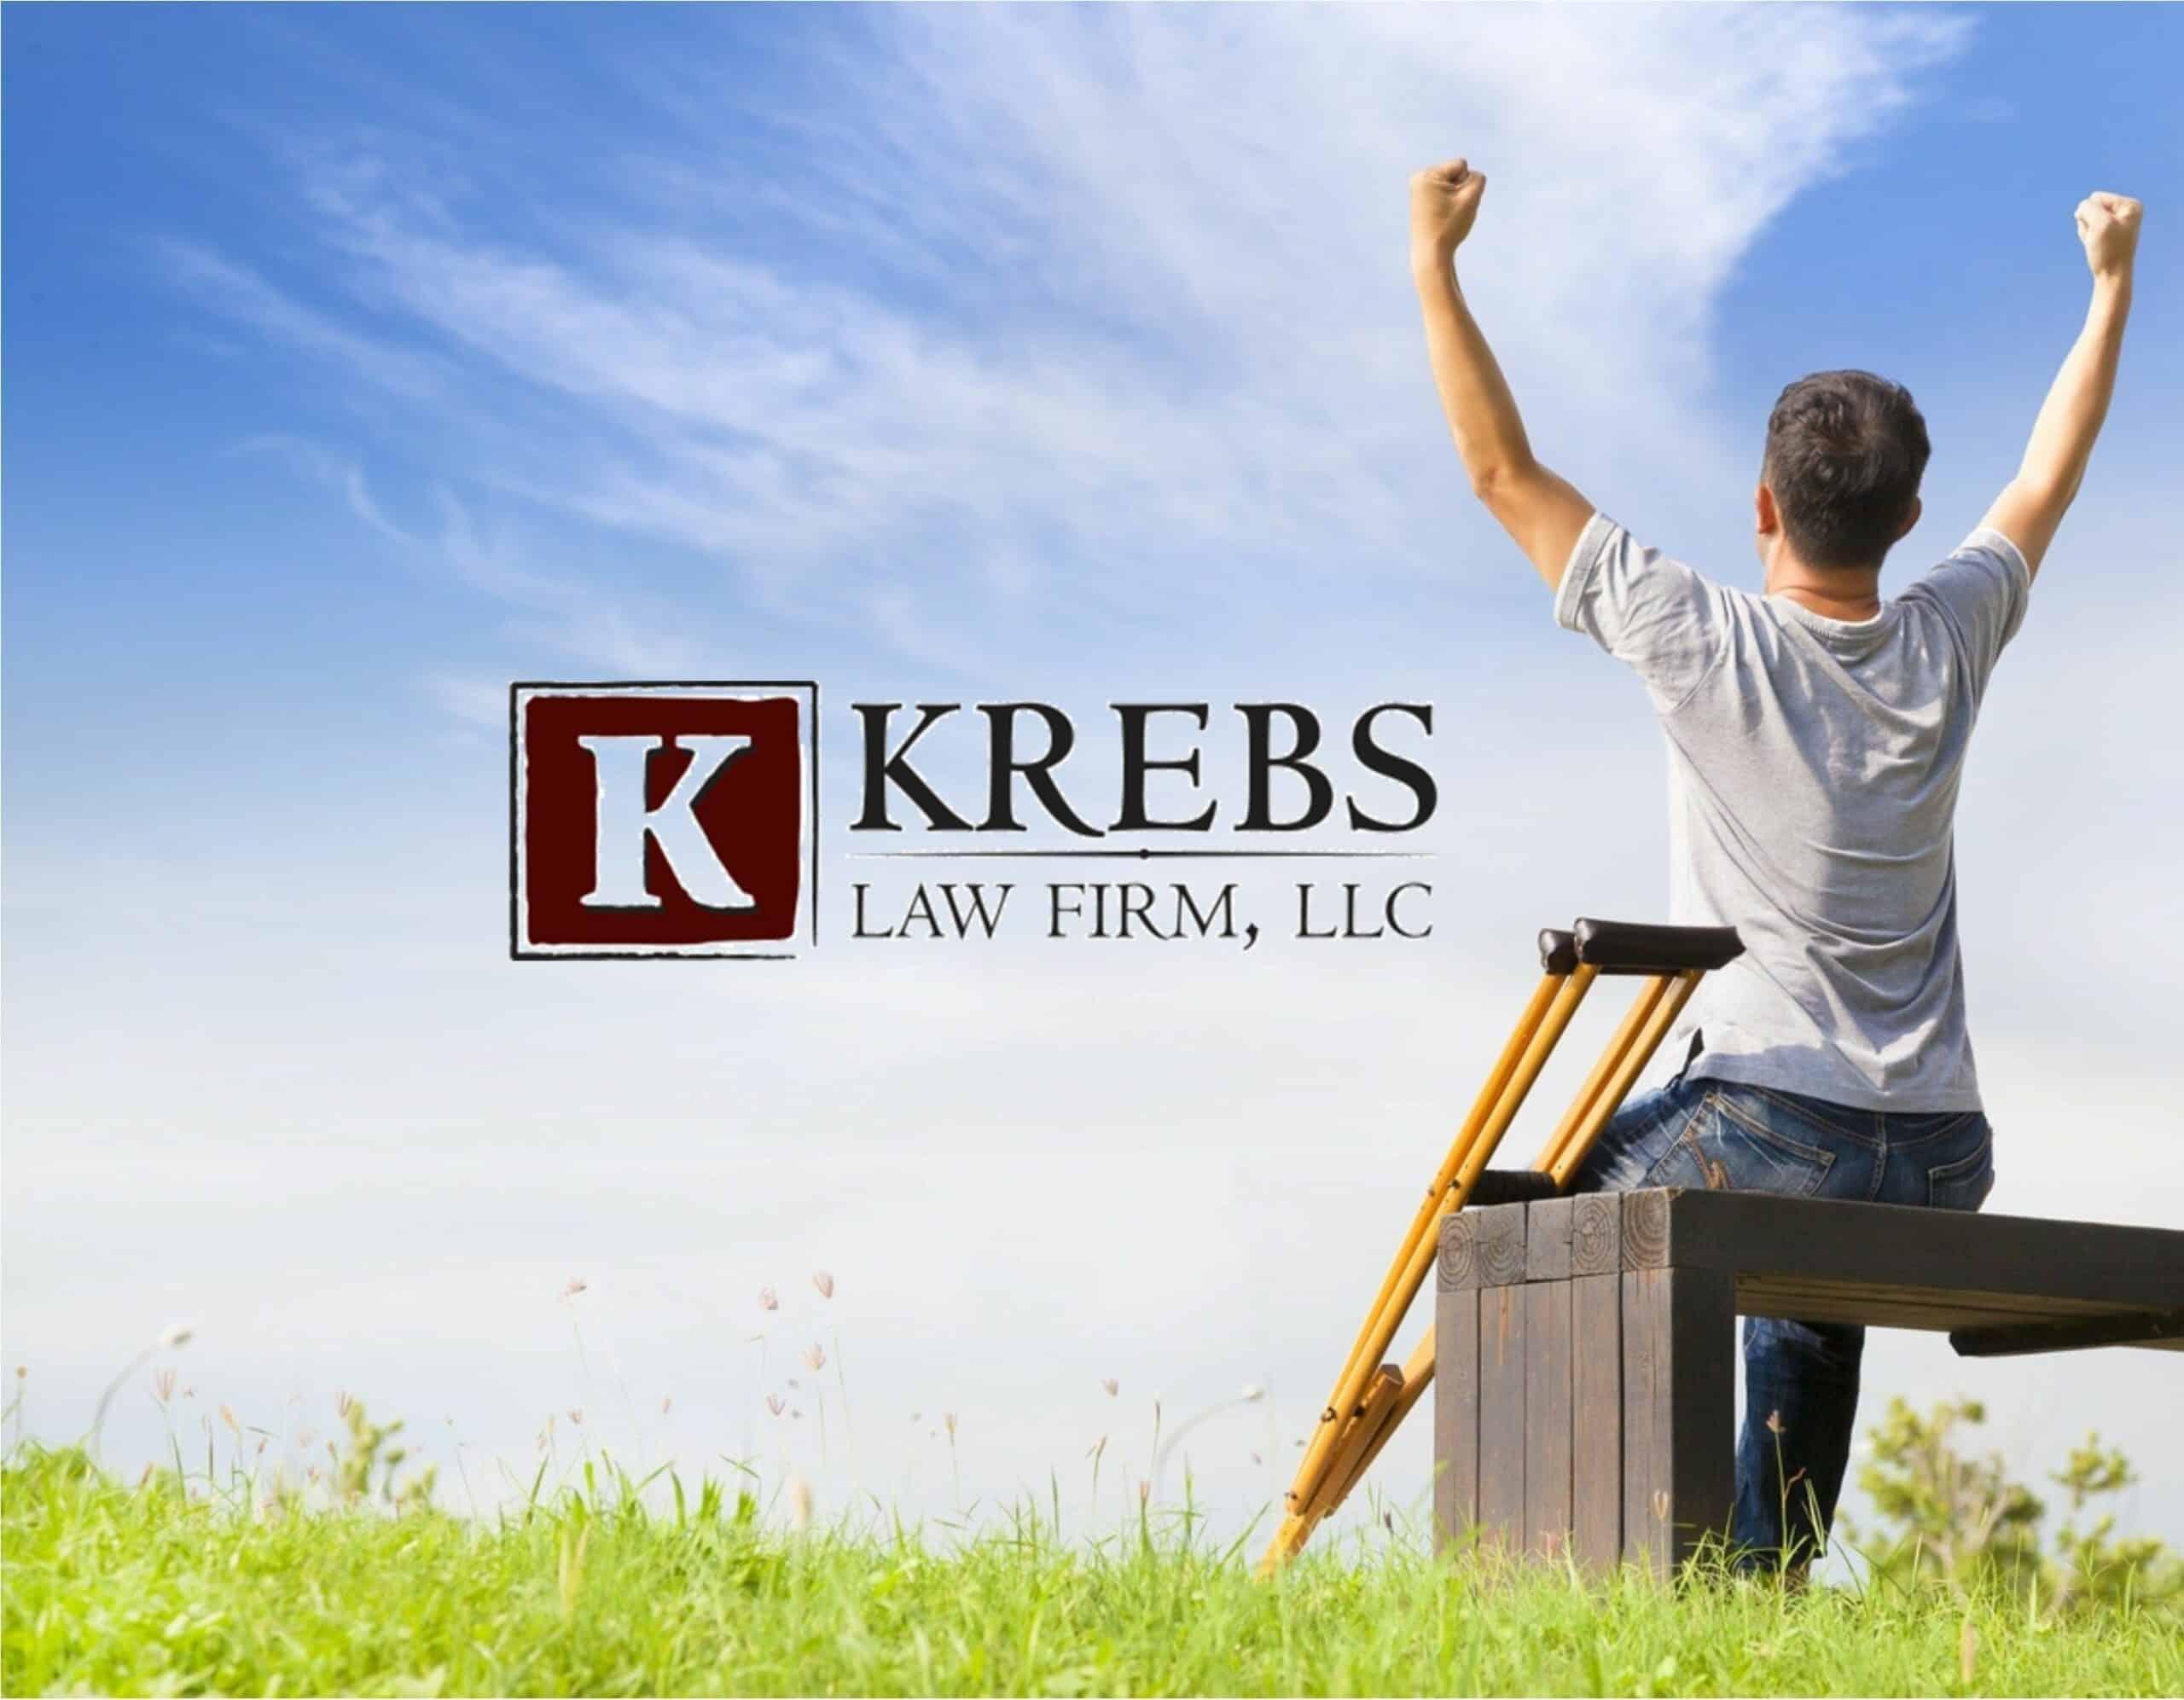 Krebs Law Firm Blog